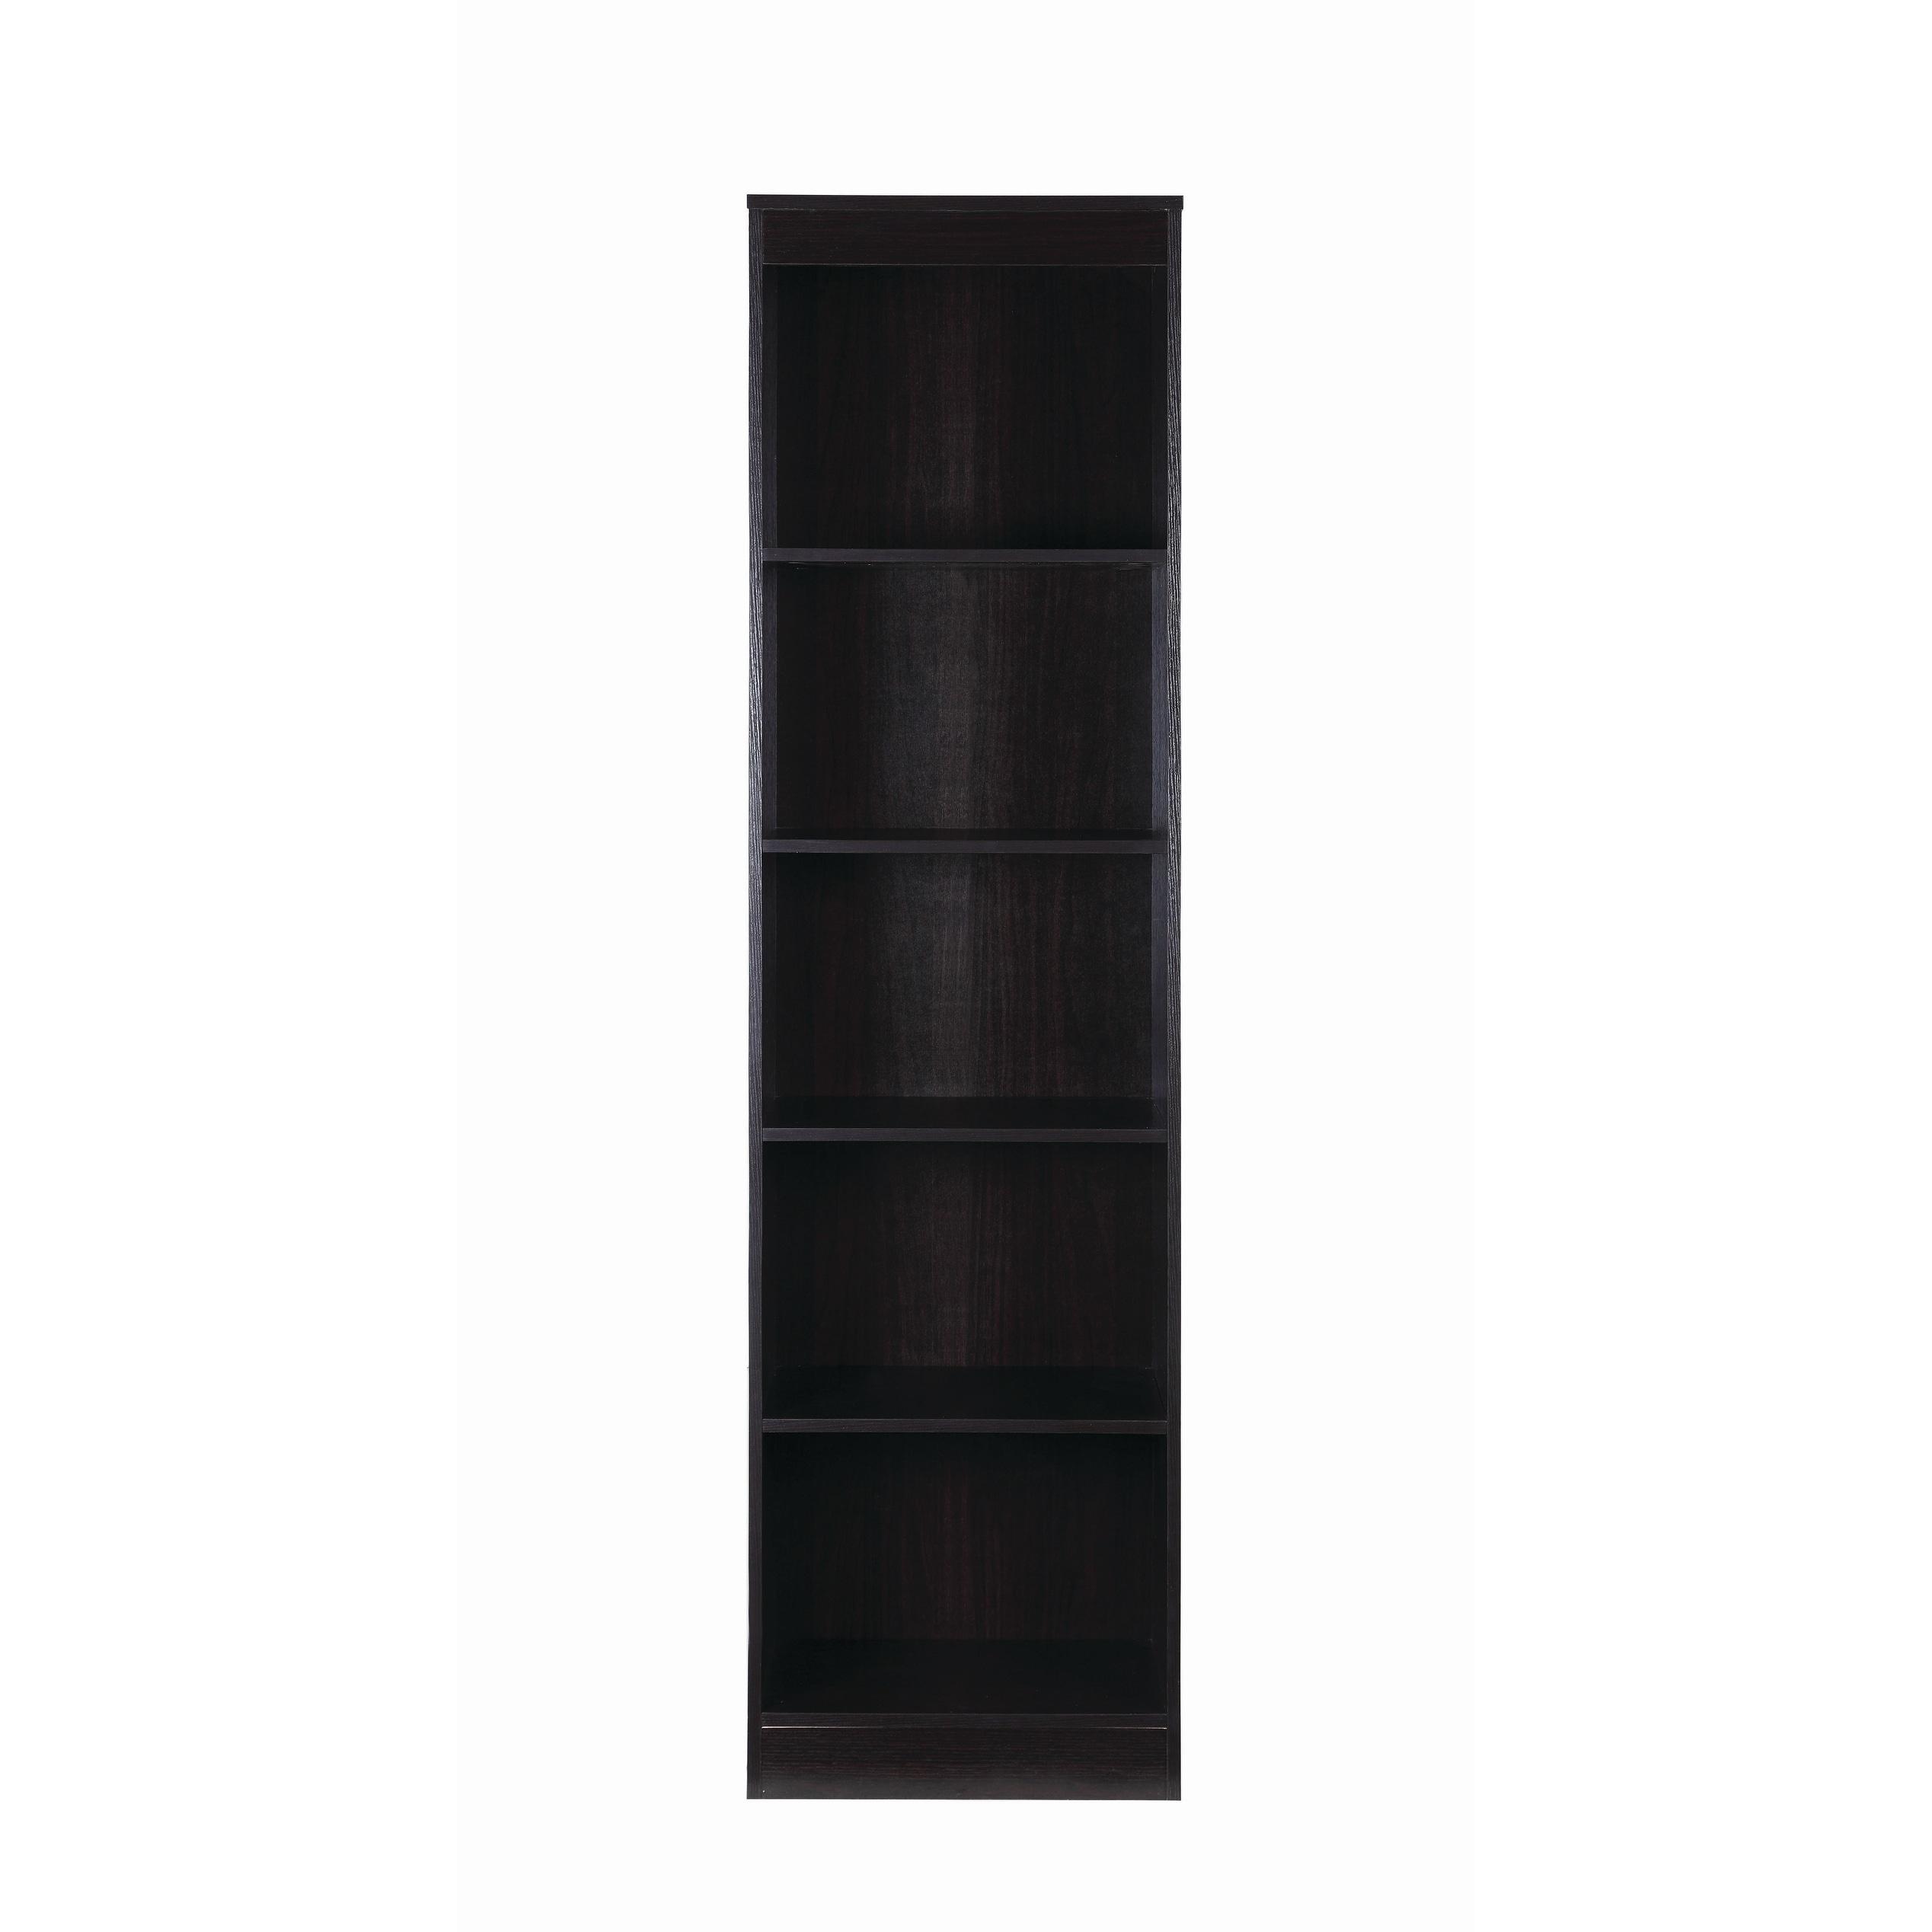 Transitional 5 Shelf Narrow Bookcase